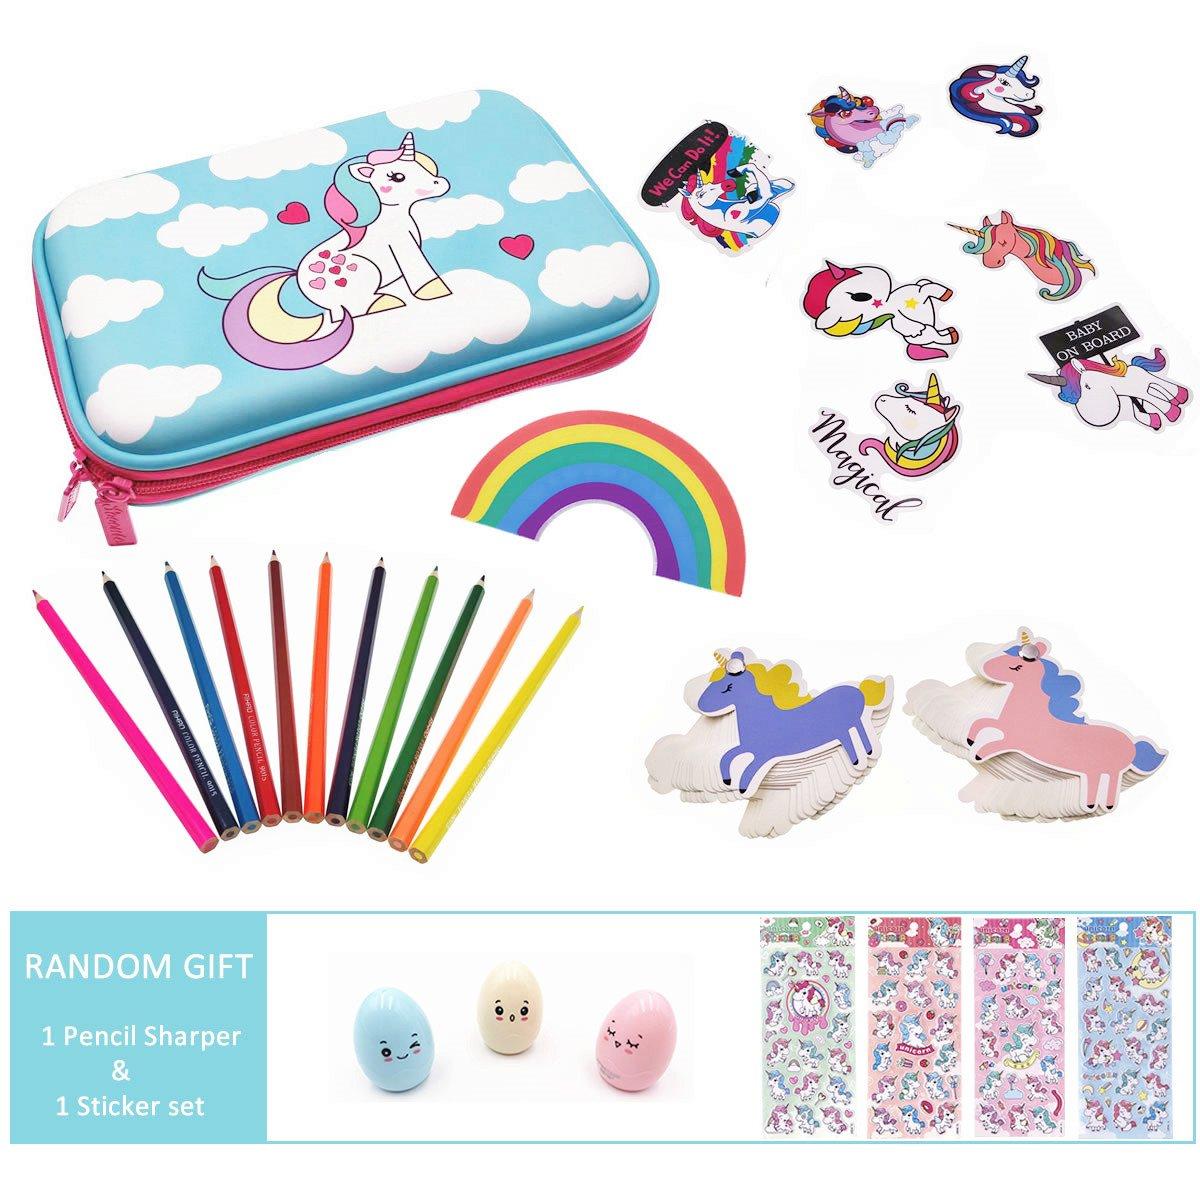 Cute Unicorn School Supplies for Girls, Unicorn Stationery Pencil Case, Pencils, Stickers and Rainbow Eraser